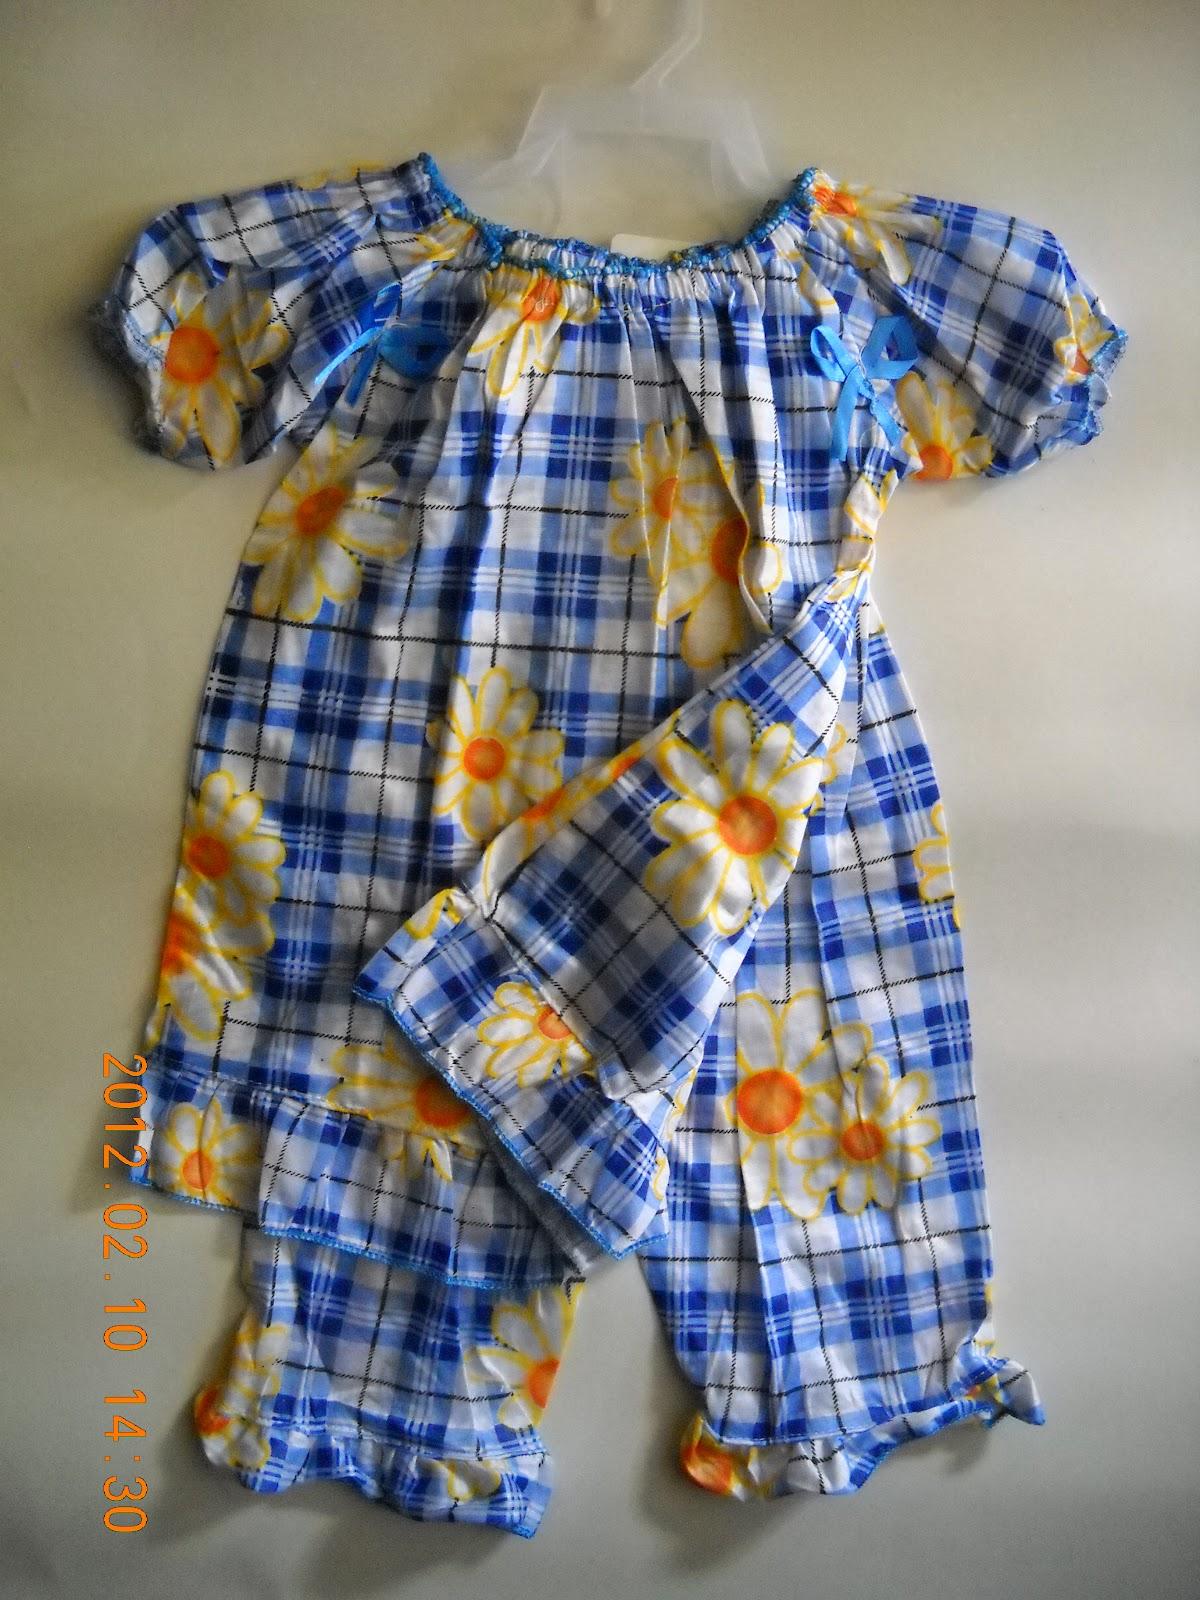 Baju Tidur Kanak2 Untuk Umur 1 2 Tahun Harga Rm10 Sepasang Borong Rm6 Moq 12 Helai Warna Saiz Campur2 Tidak Termasuk Pos